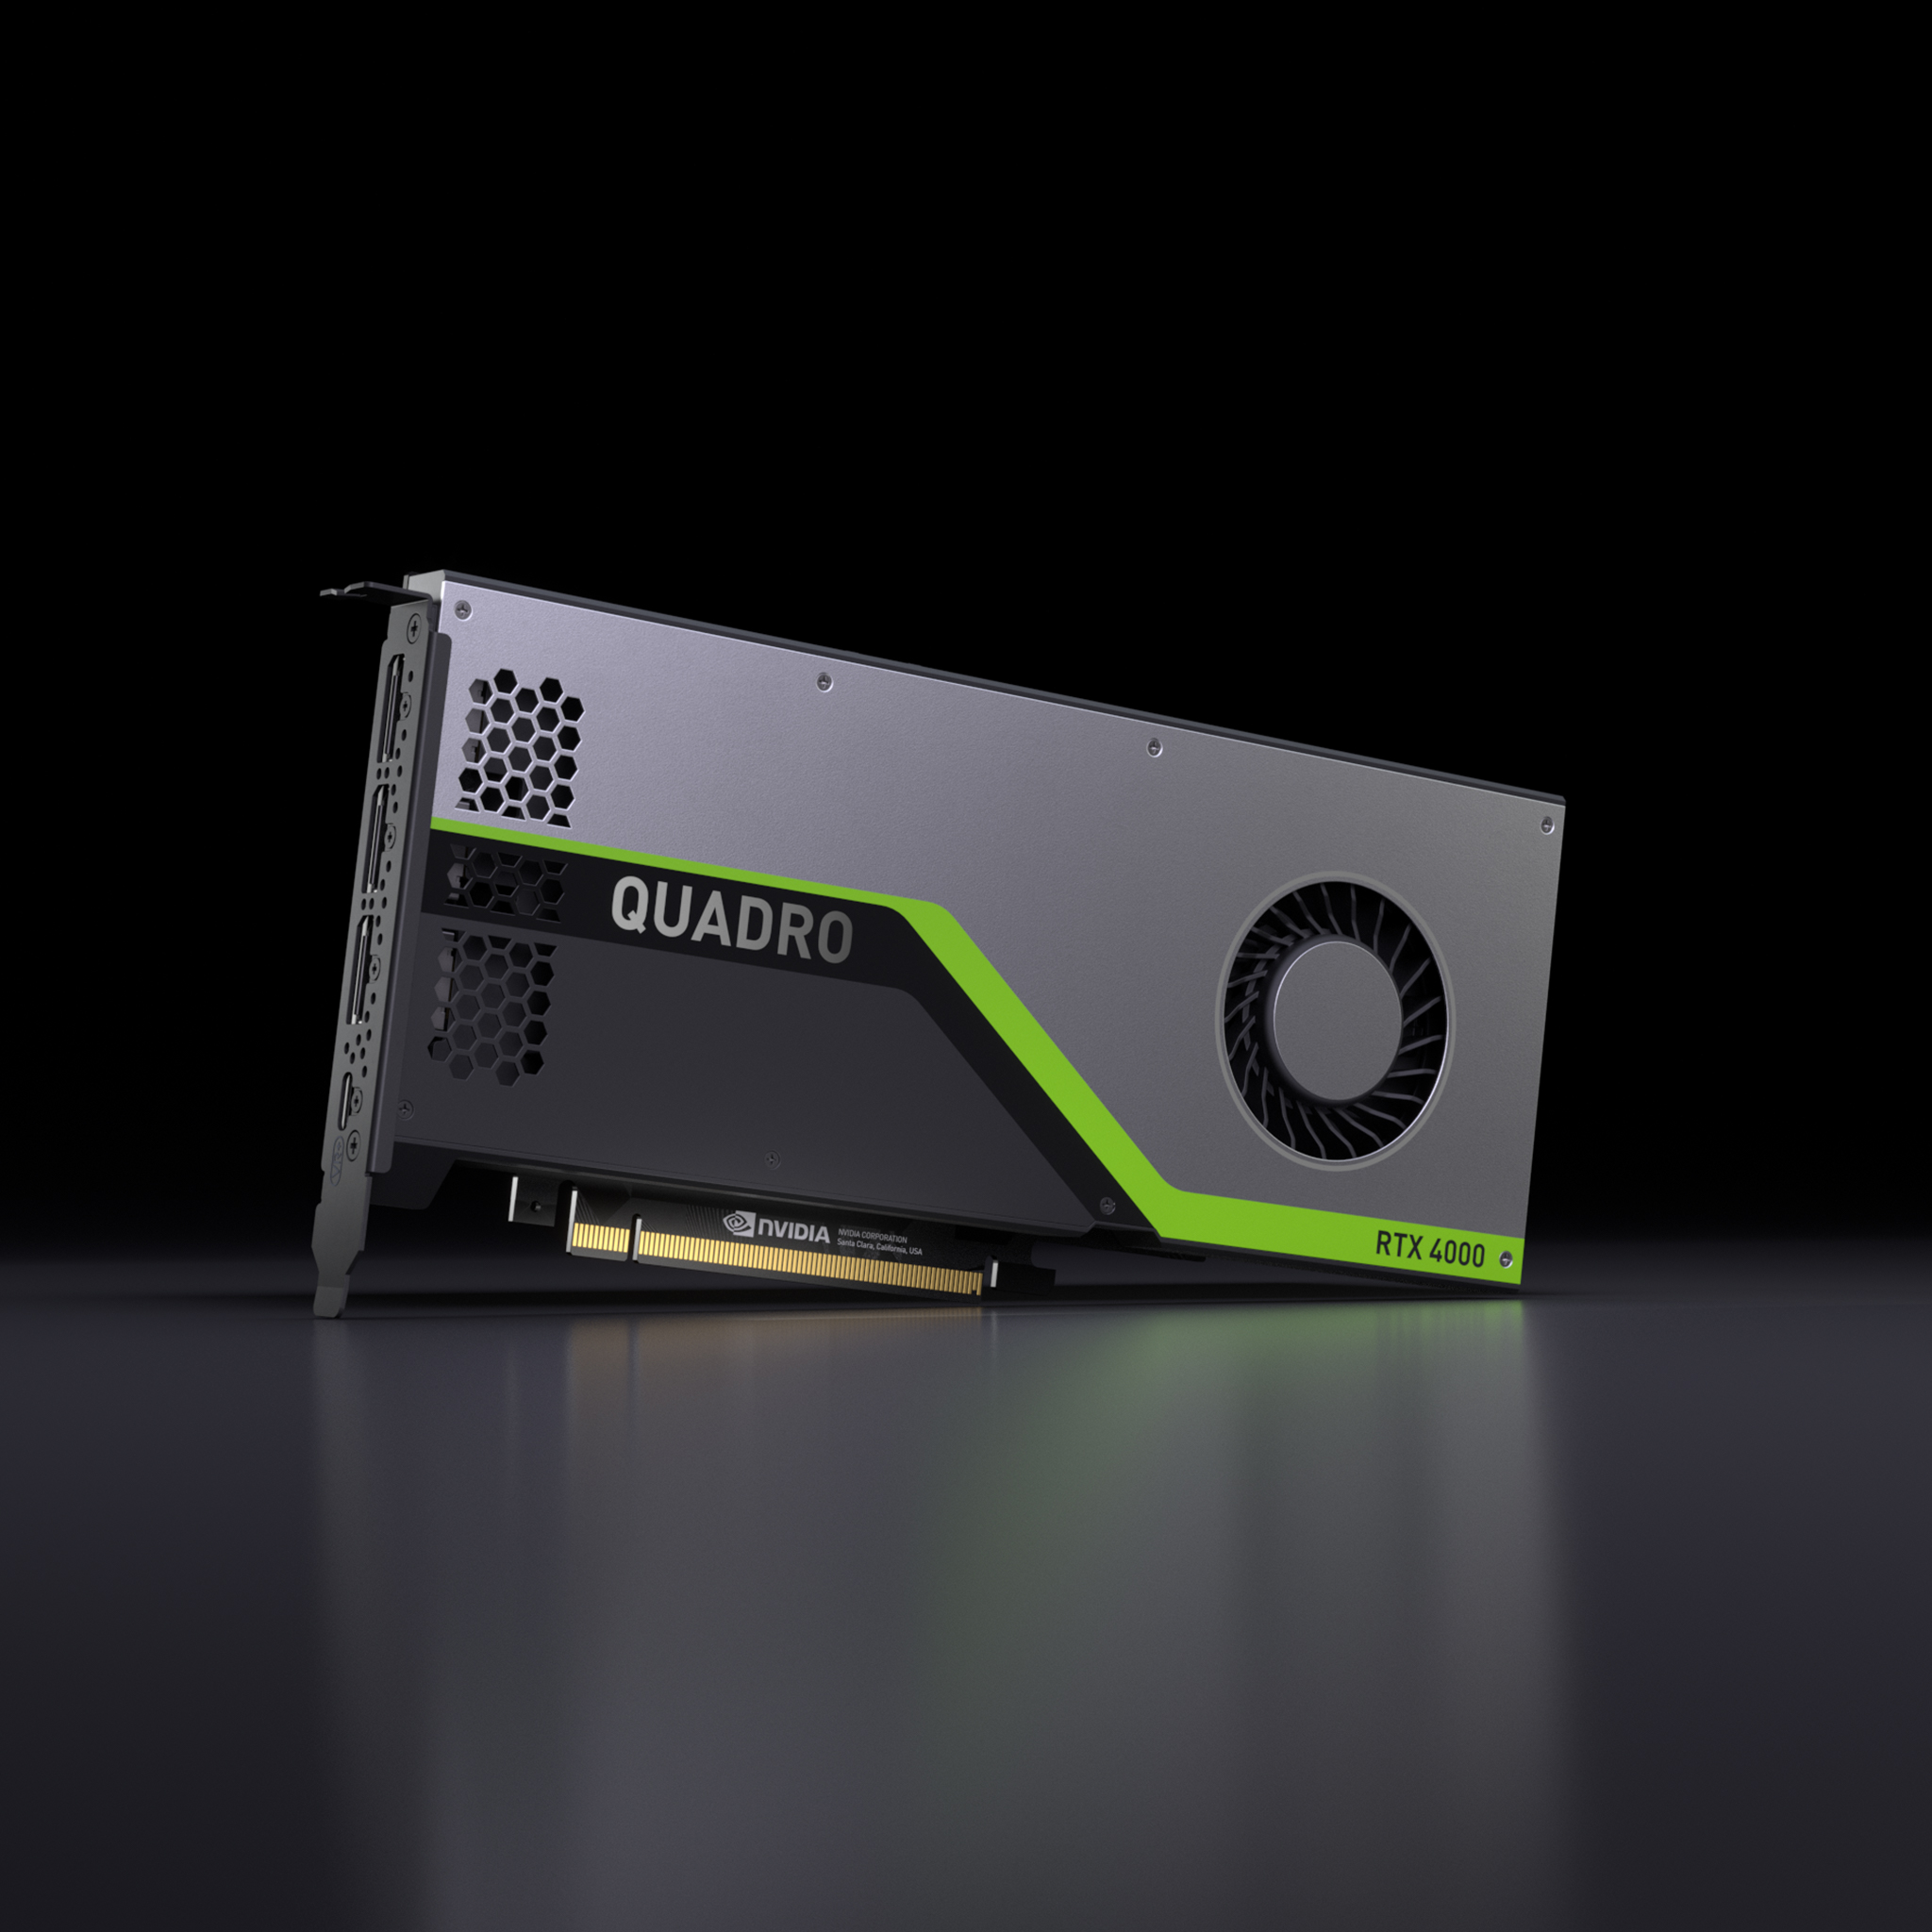 Quadro RTX 4000 Graphics Card | NVIDIA Quadro